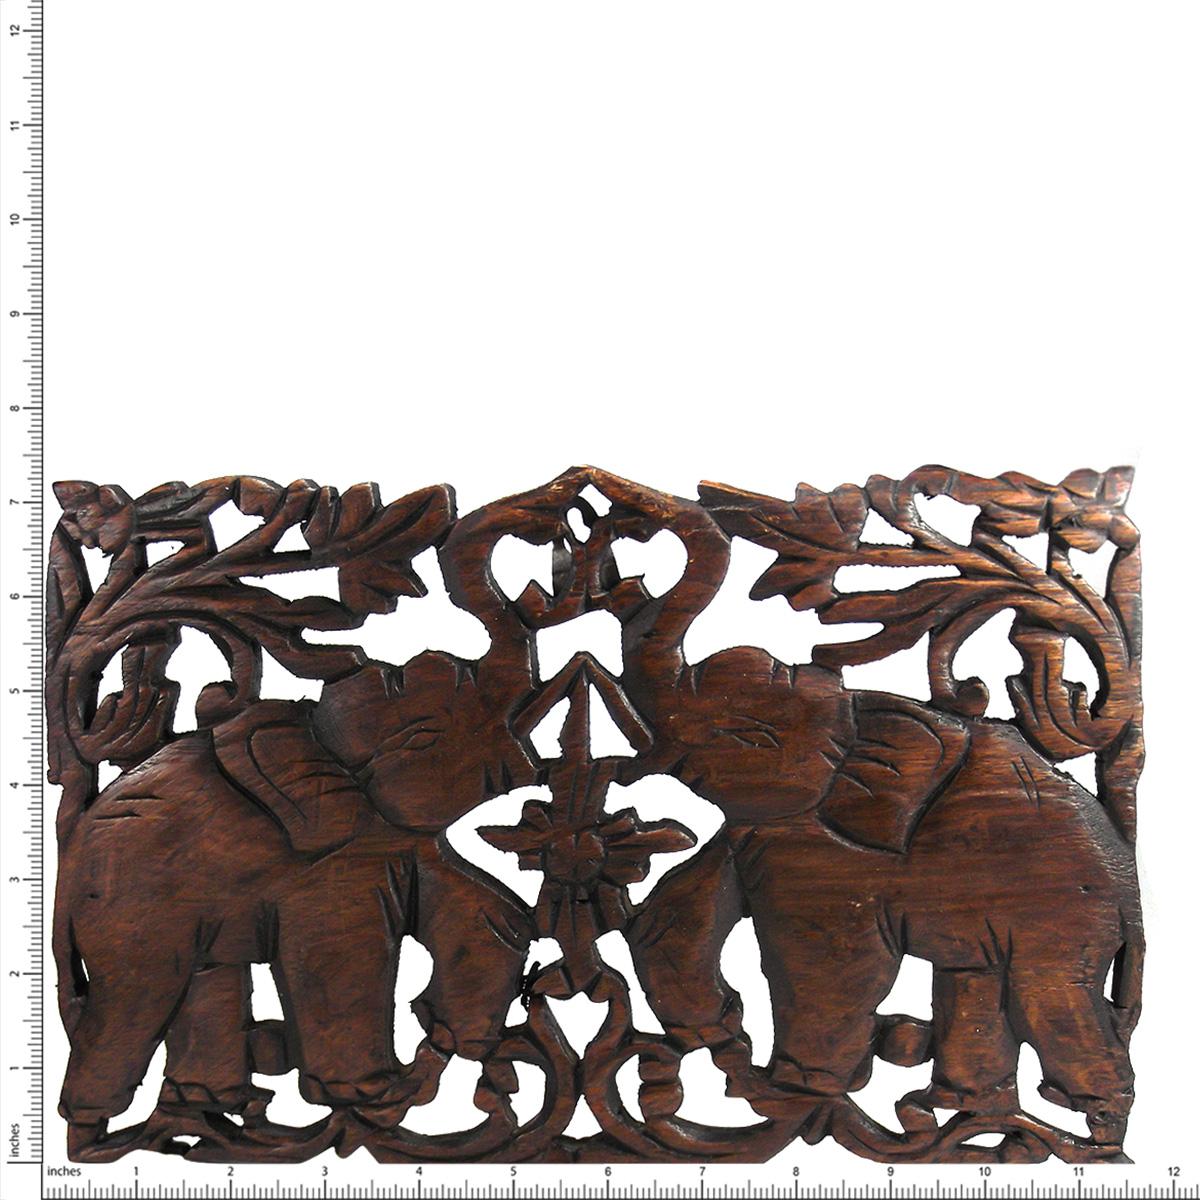 Jubilant Double Thai Elephant Calves Hand Carved Teak Wood Wall Art 7x12 Aeravida